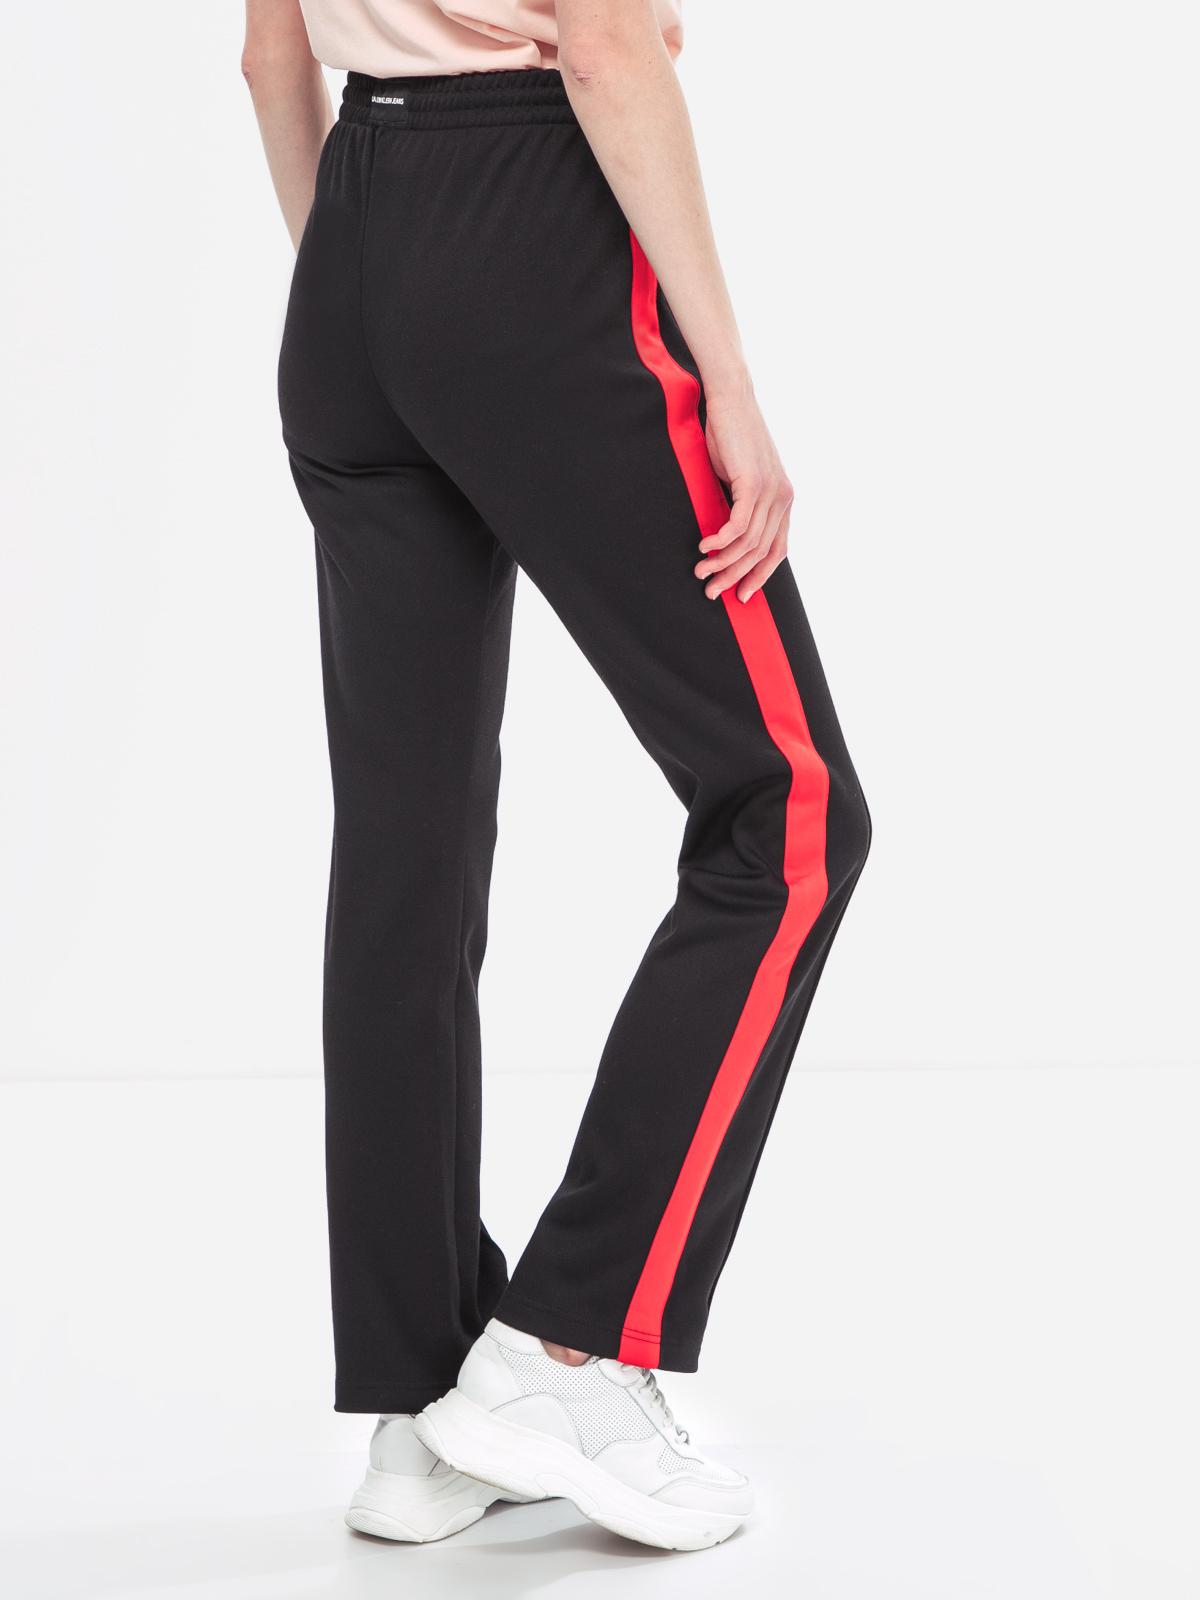 d3f4d4f8cb4 Naiste aktiivse vabaaja püksid calvin klein jeans | Newmood